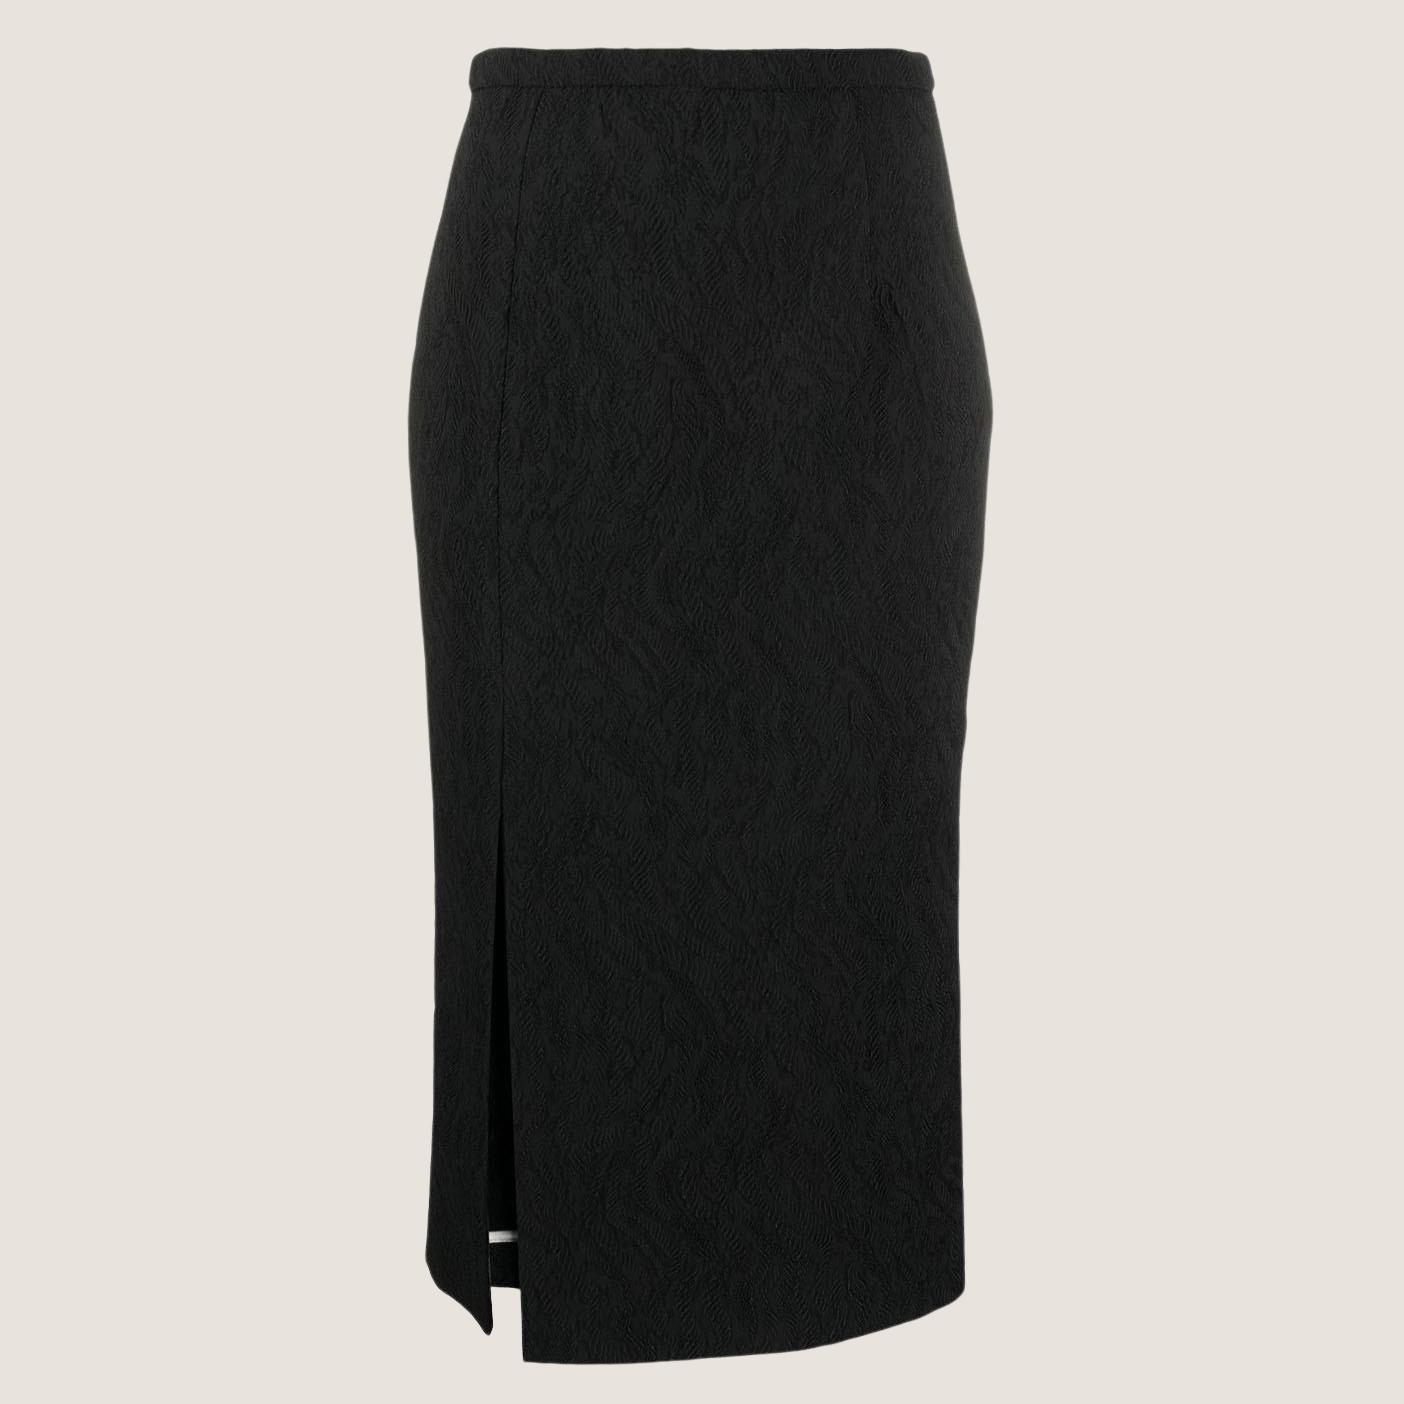 Robinier Skirt